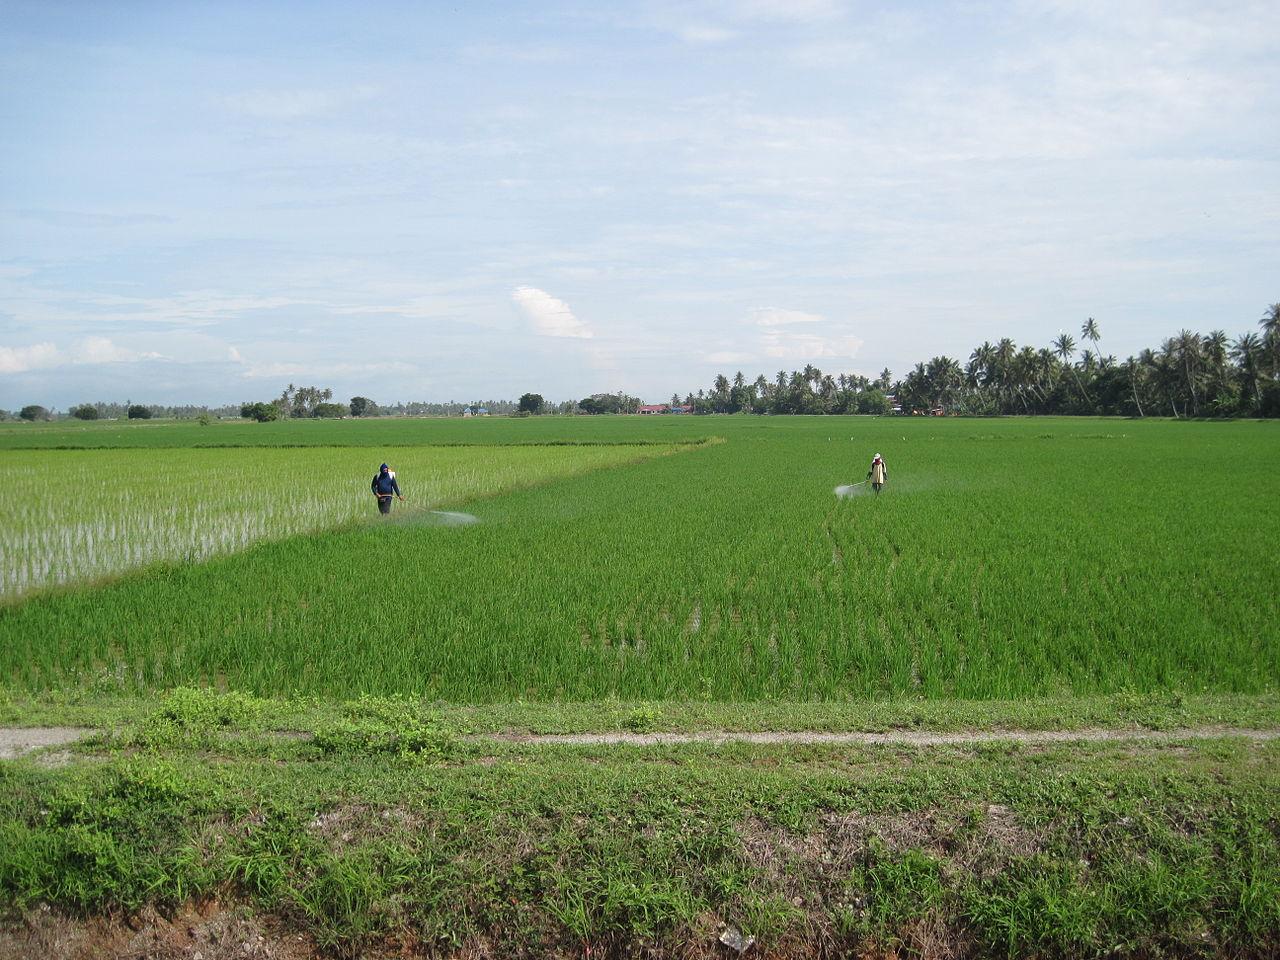 Orang kampung menyembur racun di padi.JPG